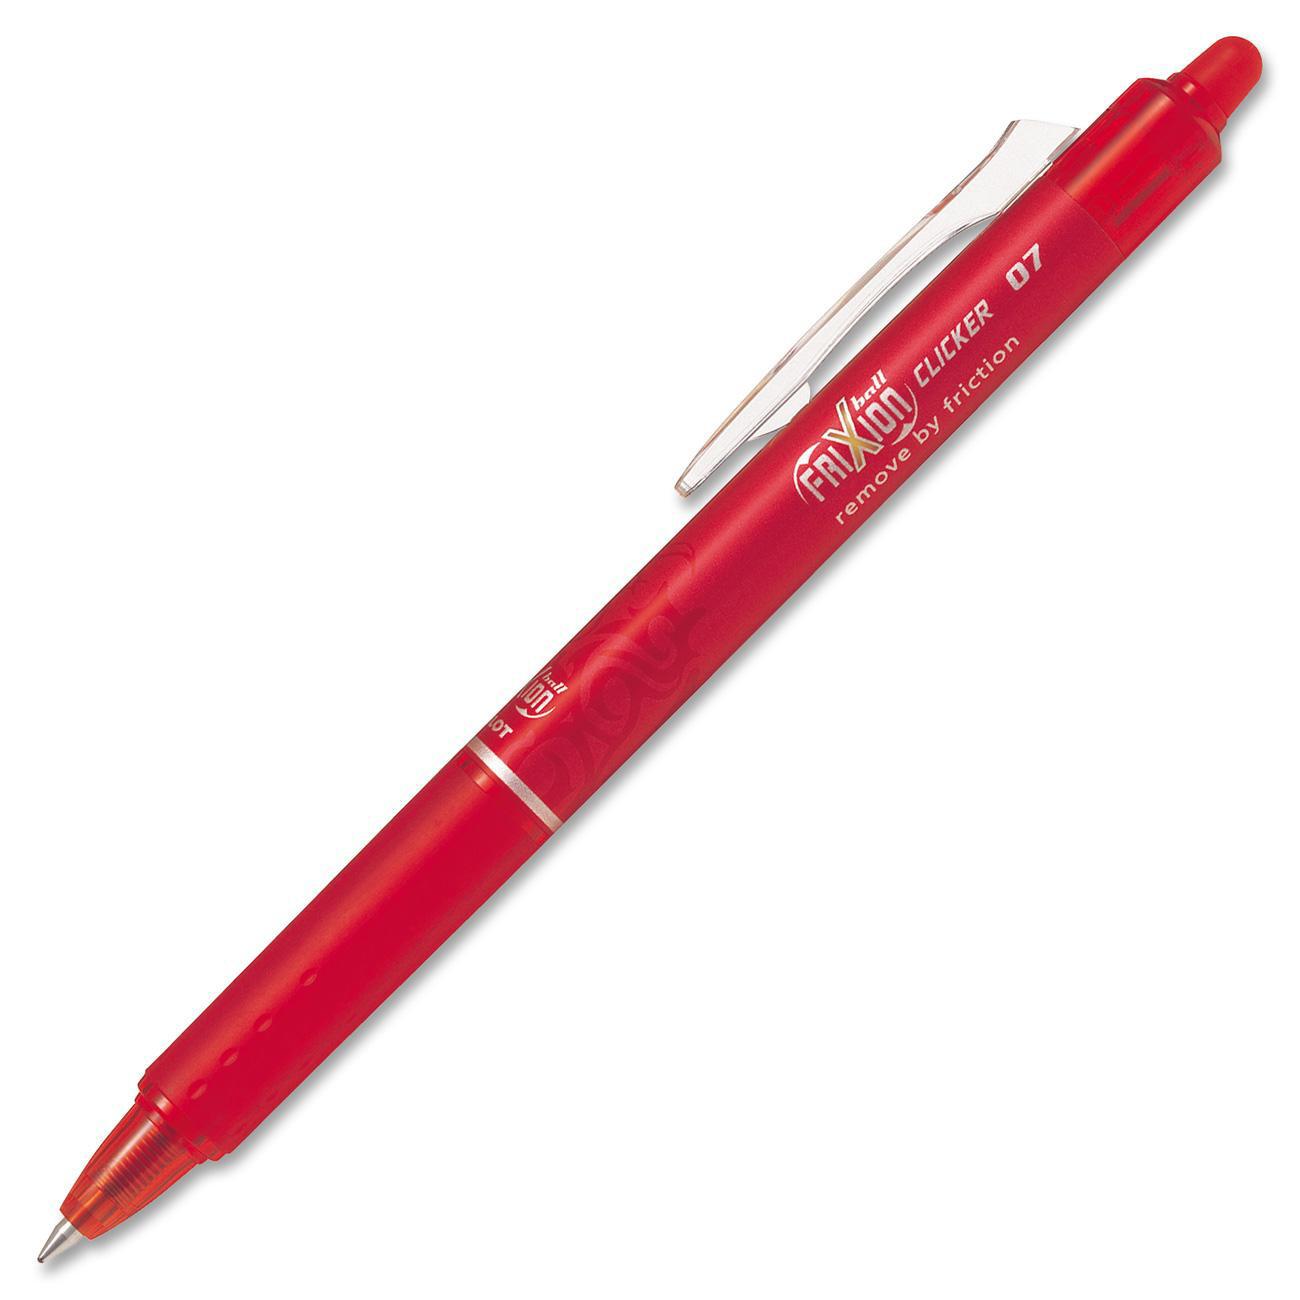 Pen, Erasable,Retractable, Gel, FriXion Red, Single, 0.7 Mm,  Refillable